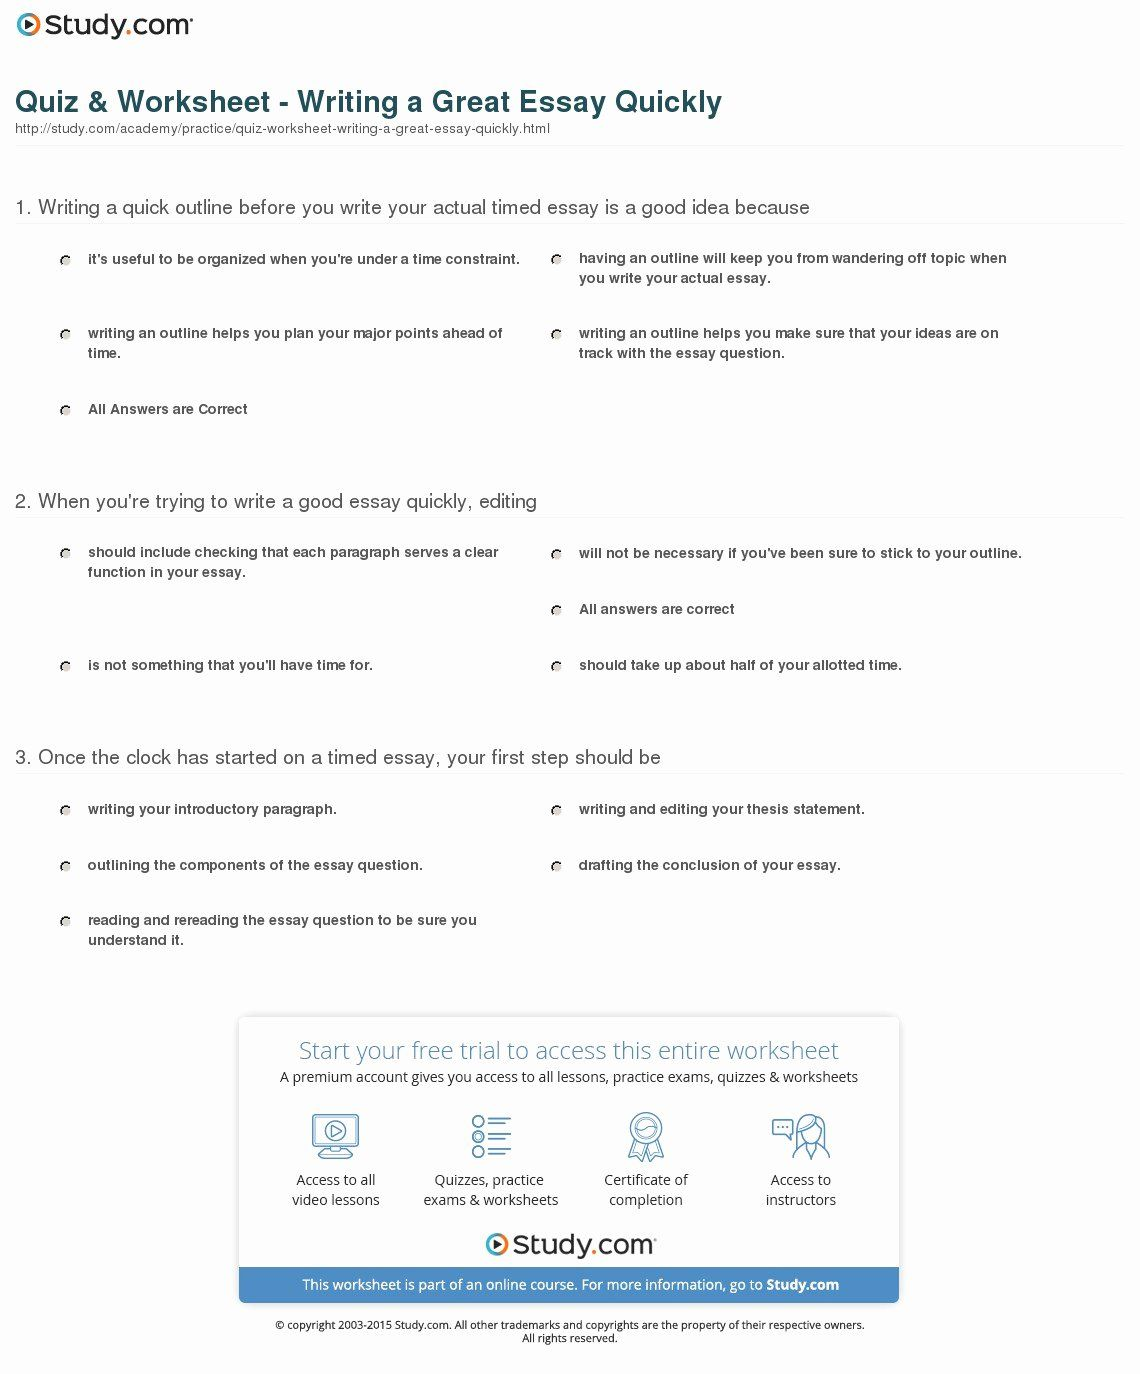 Thesis Statement Practice Worksheet Luxury Quiz